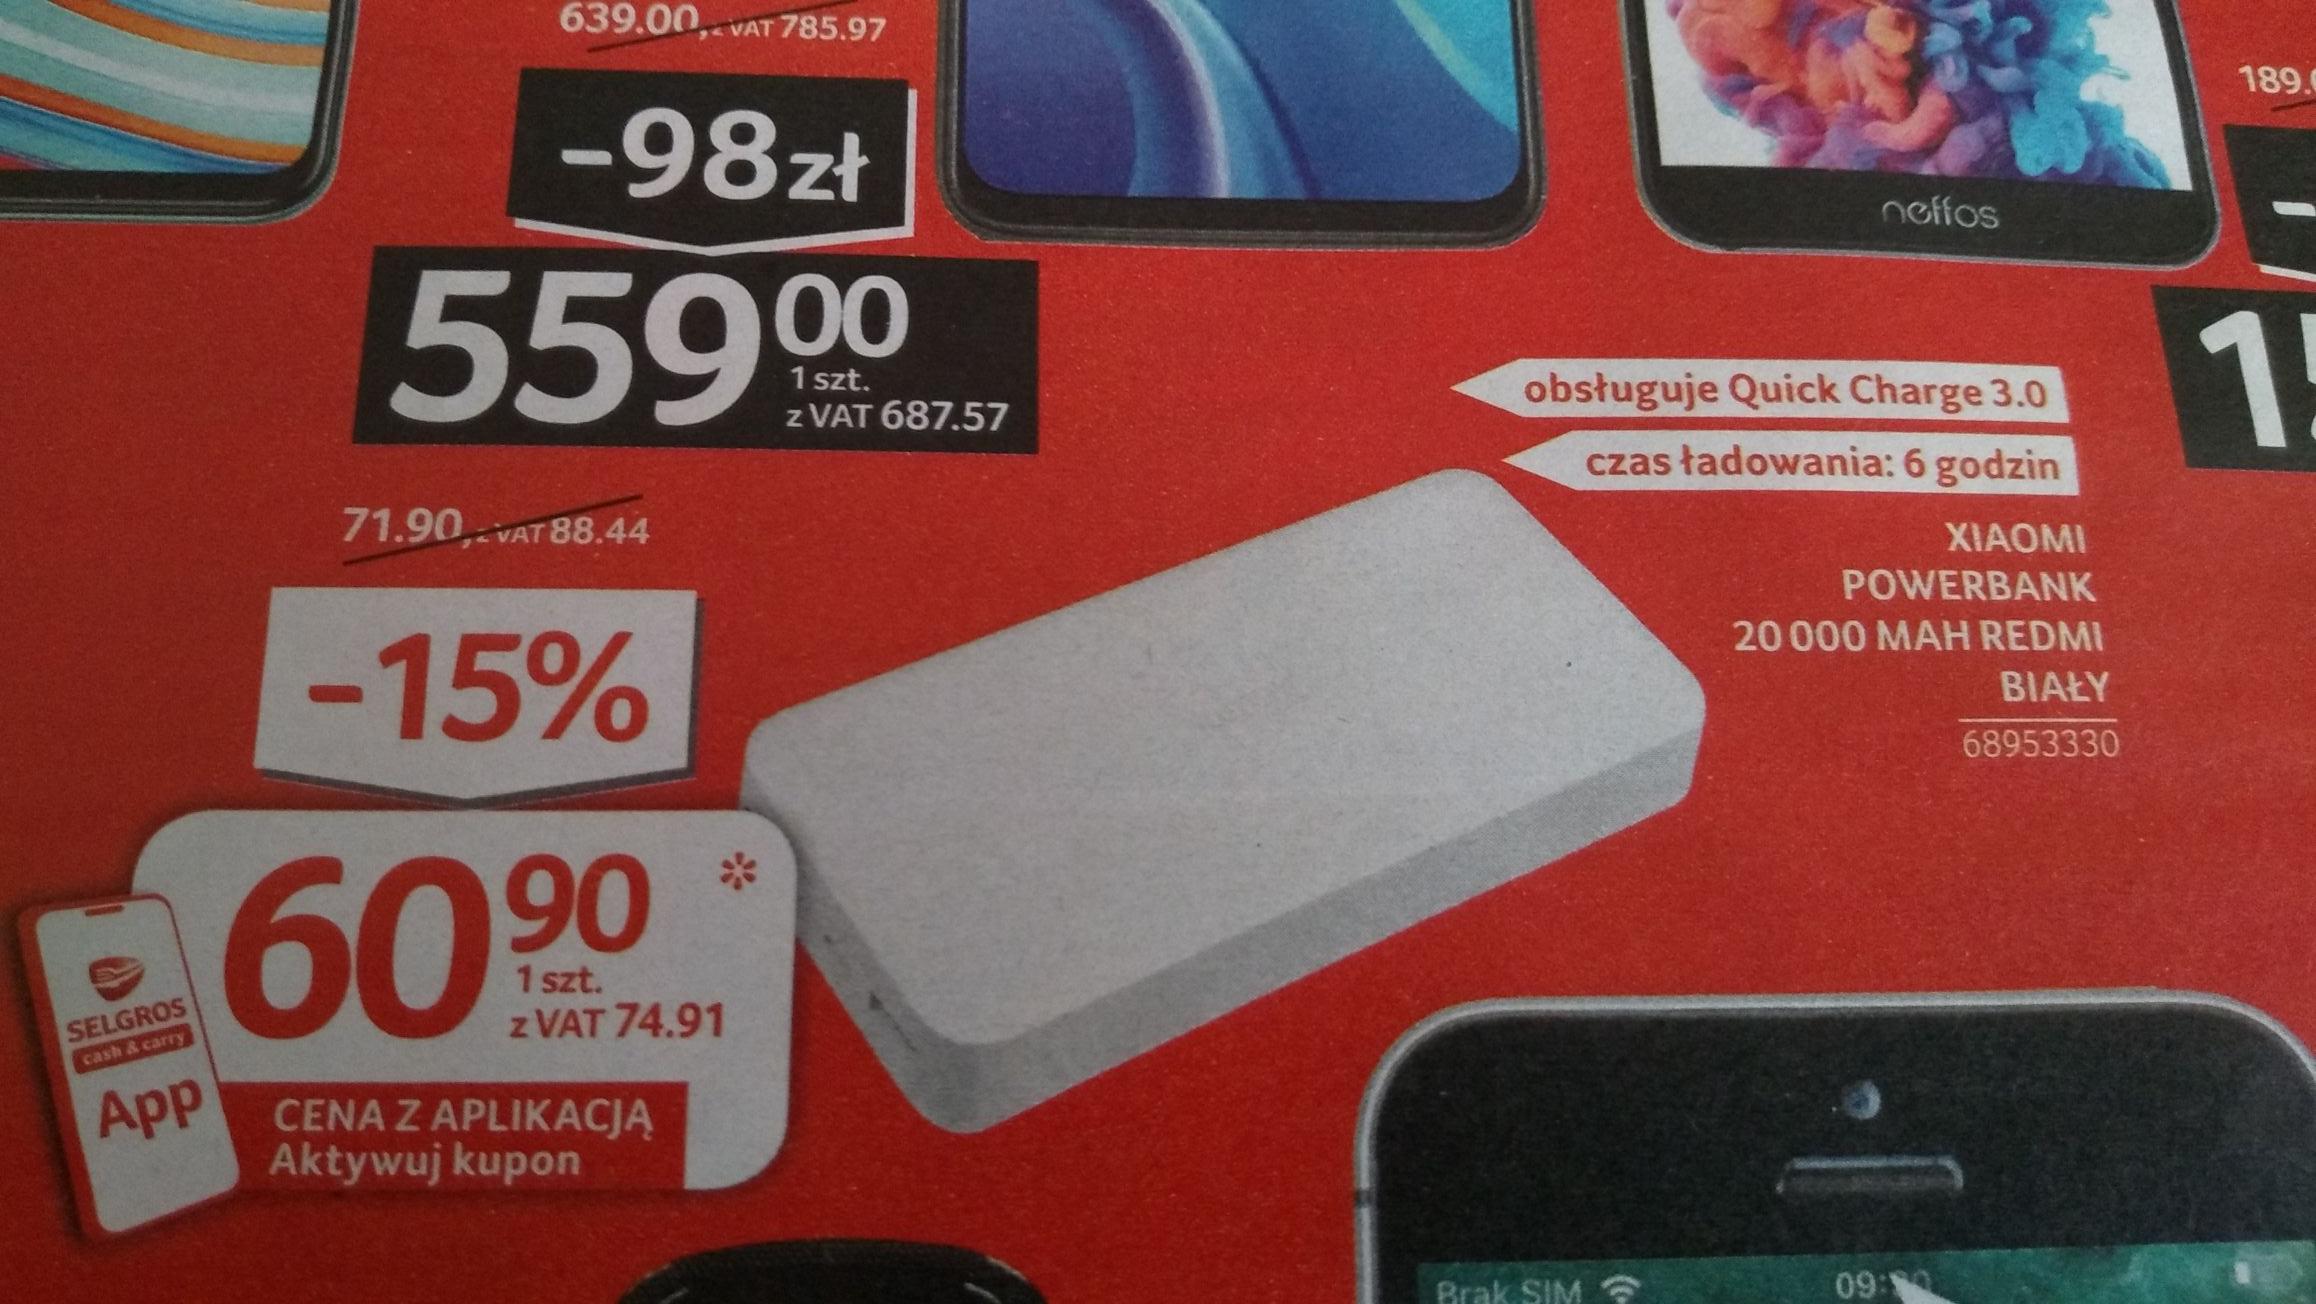 Xiaomi Redmi powerbank 20000 mAh w Selgros